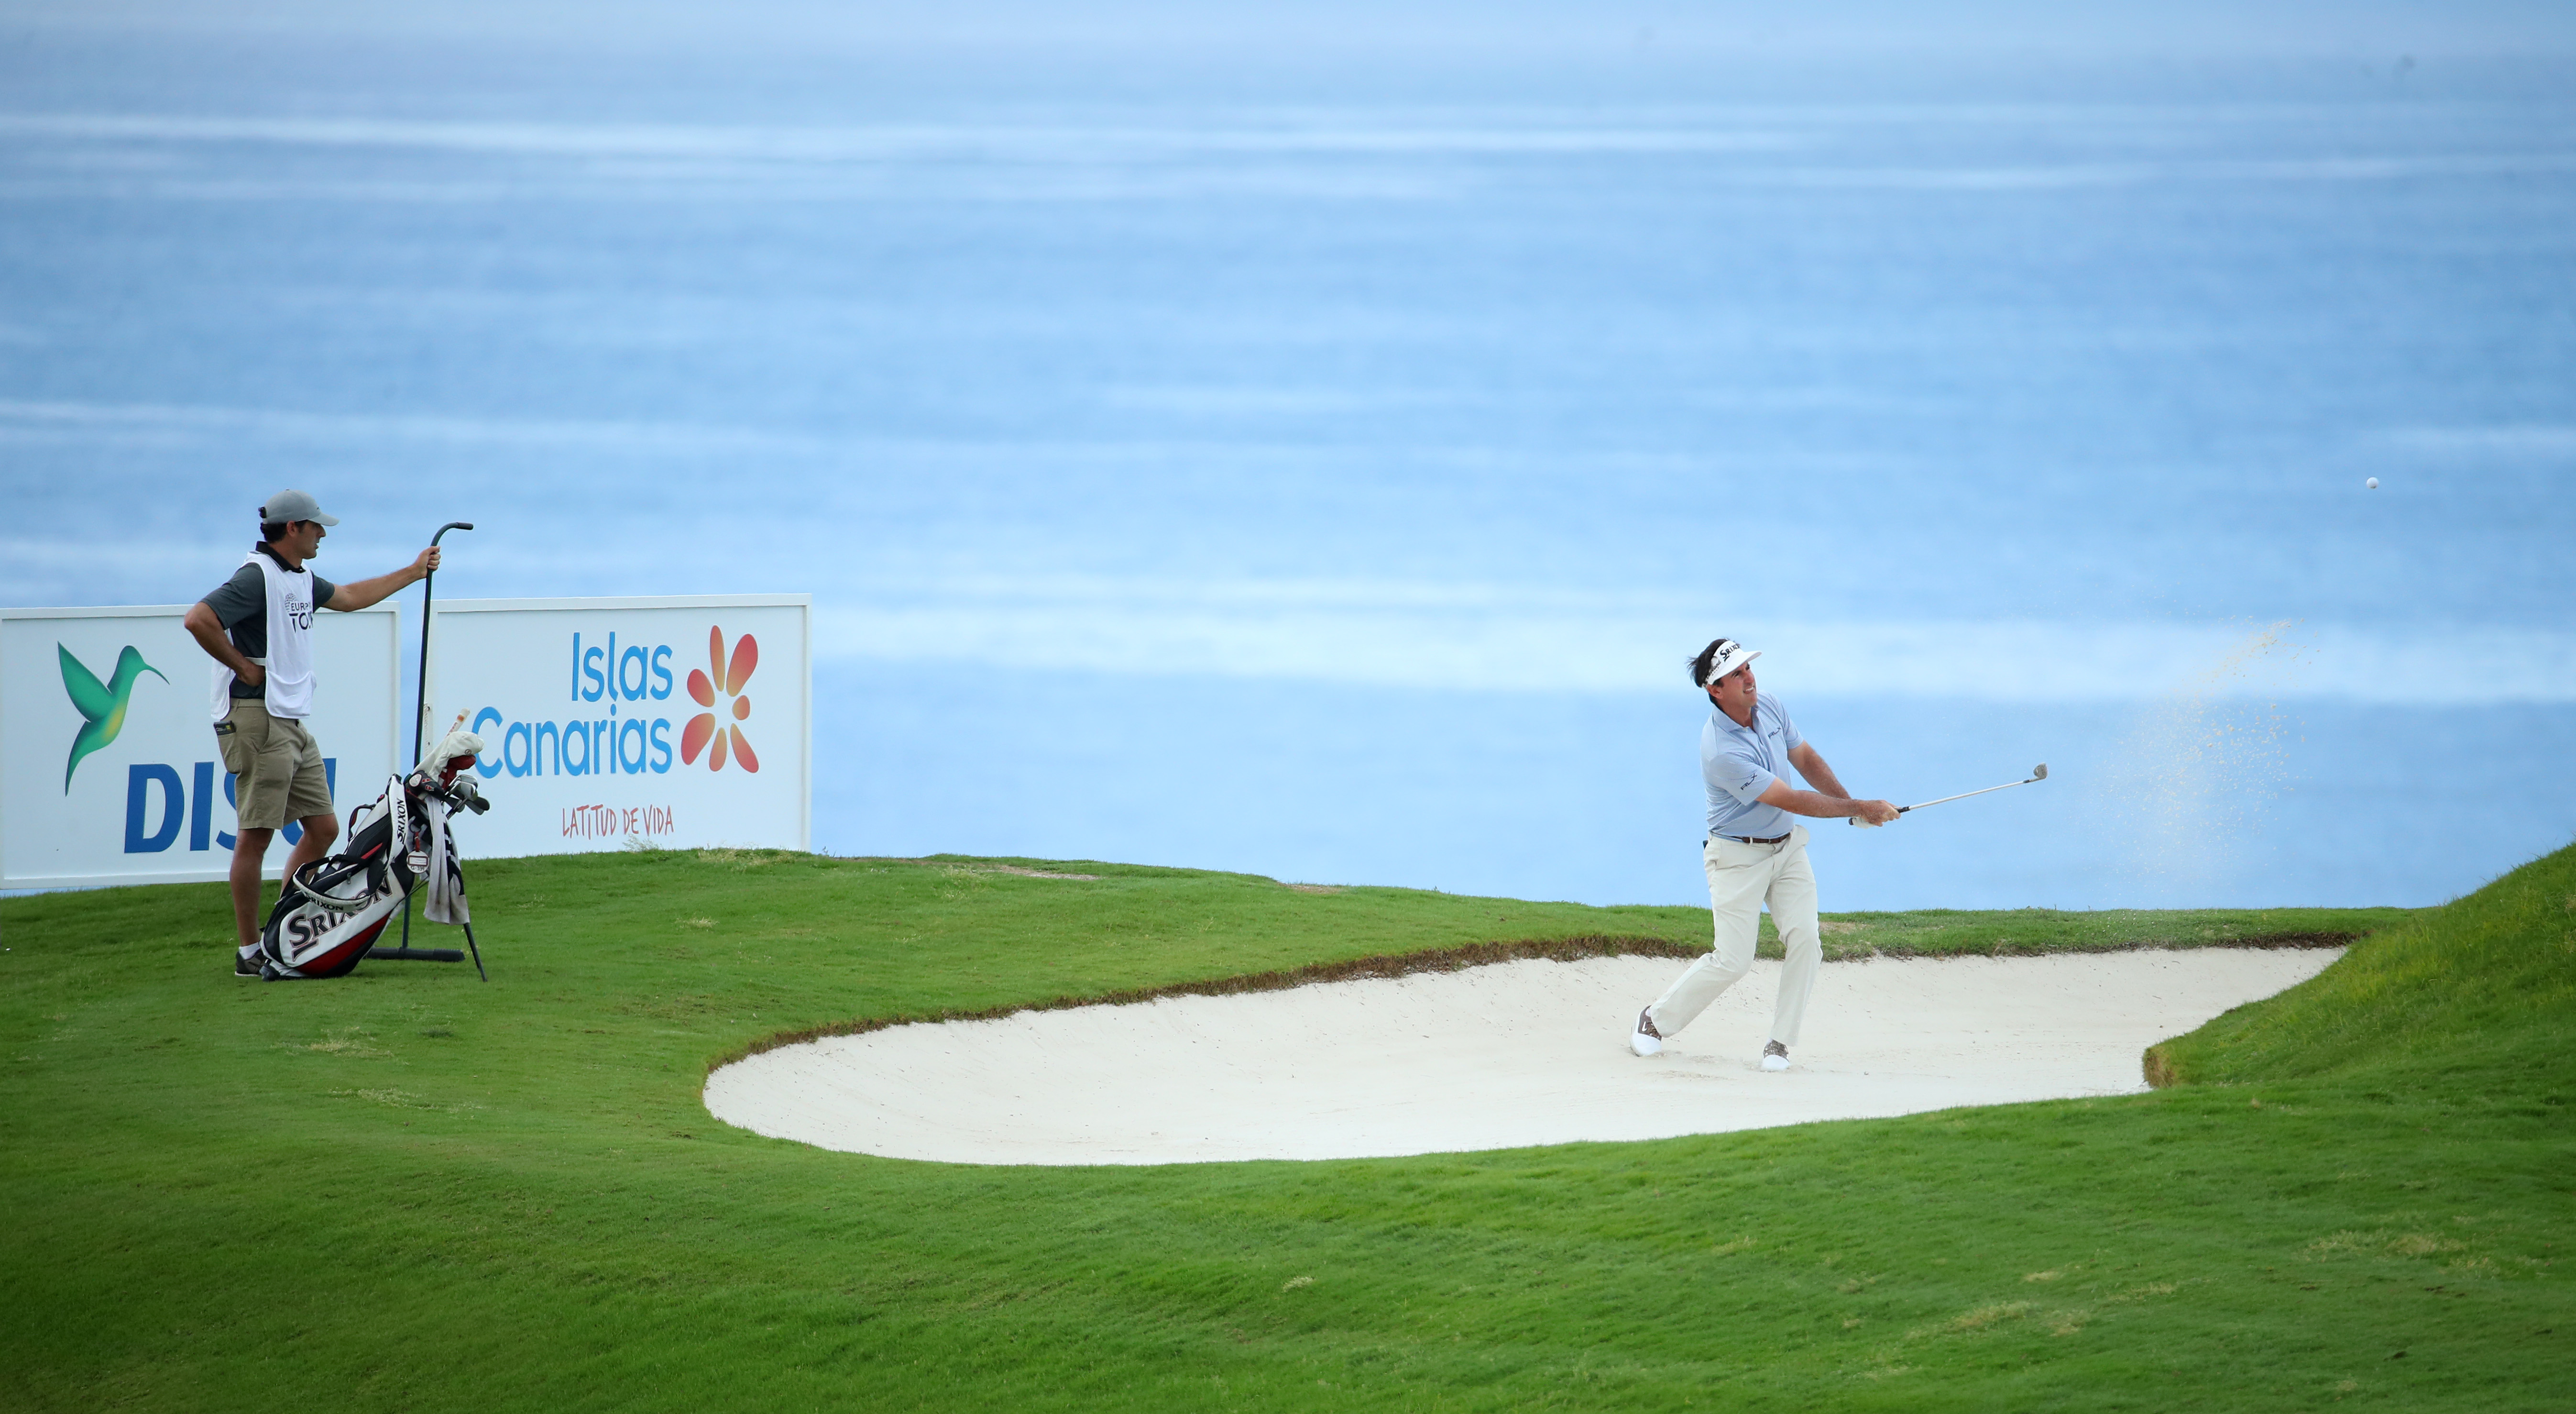 Torneos de golf PGA European Tour en Canarias / Getty Images